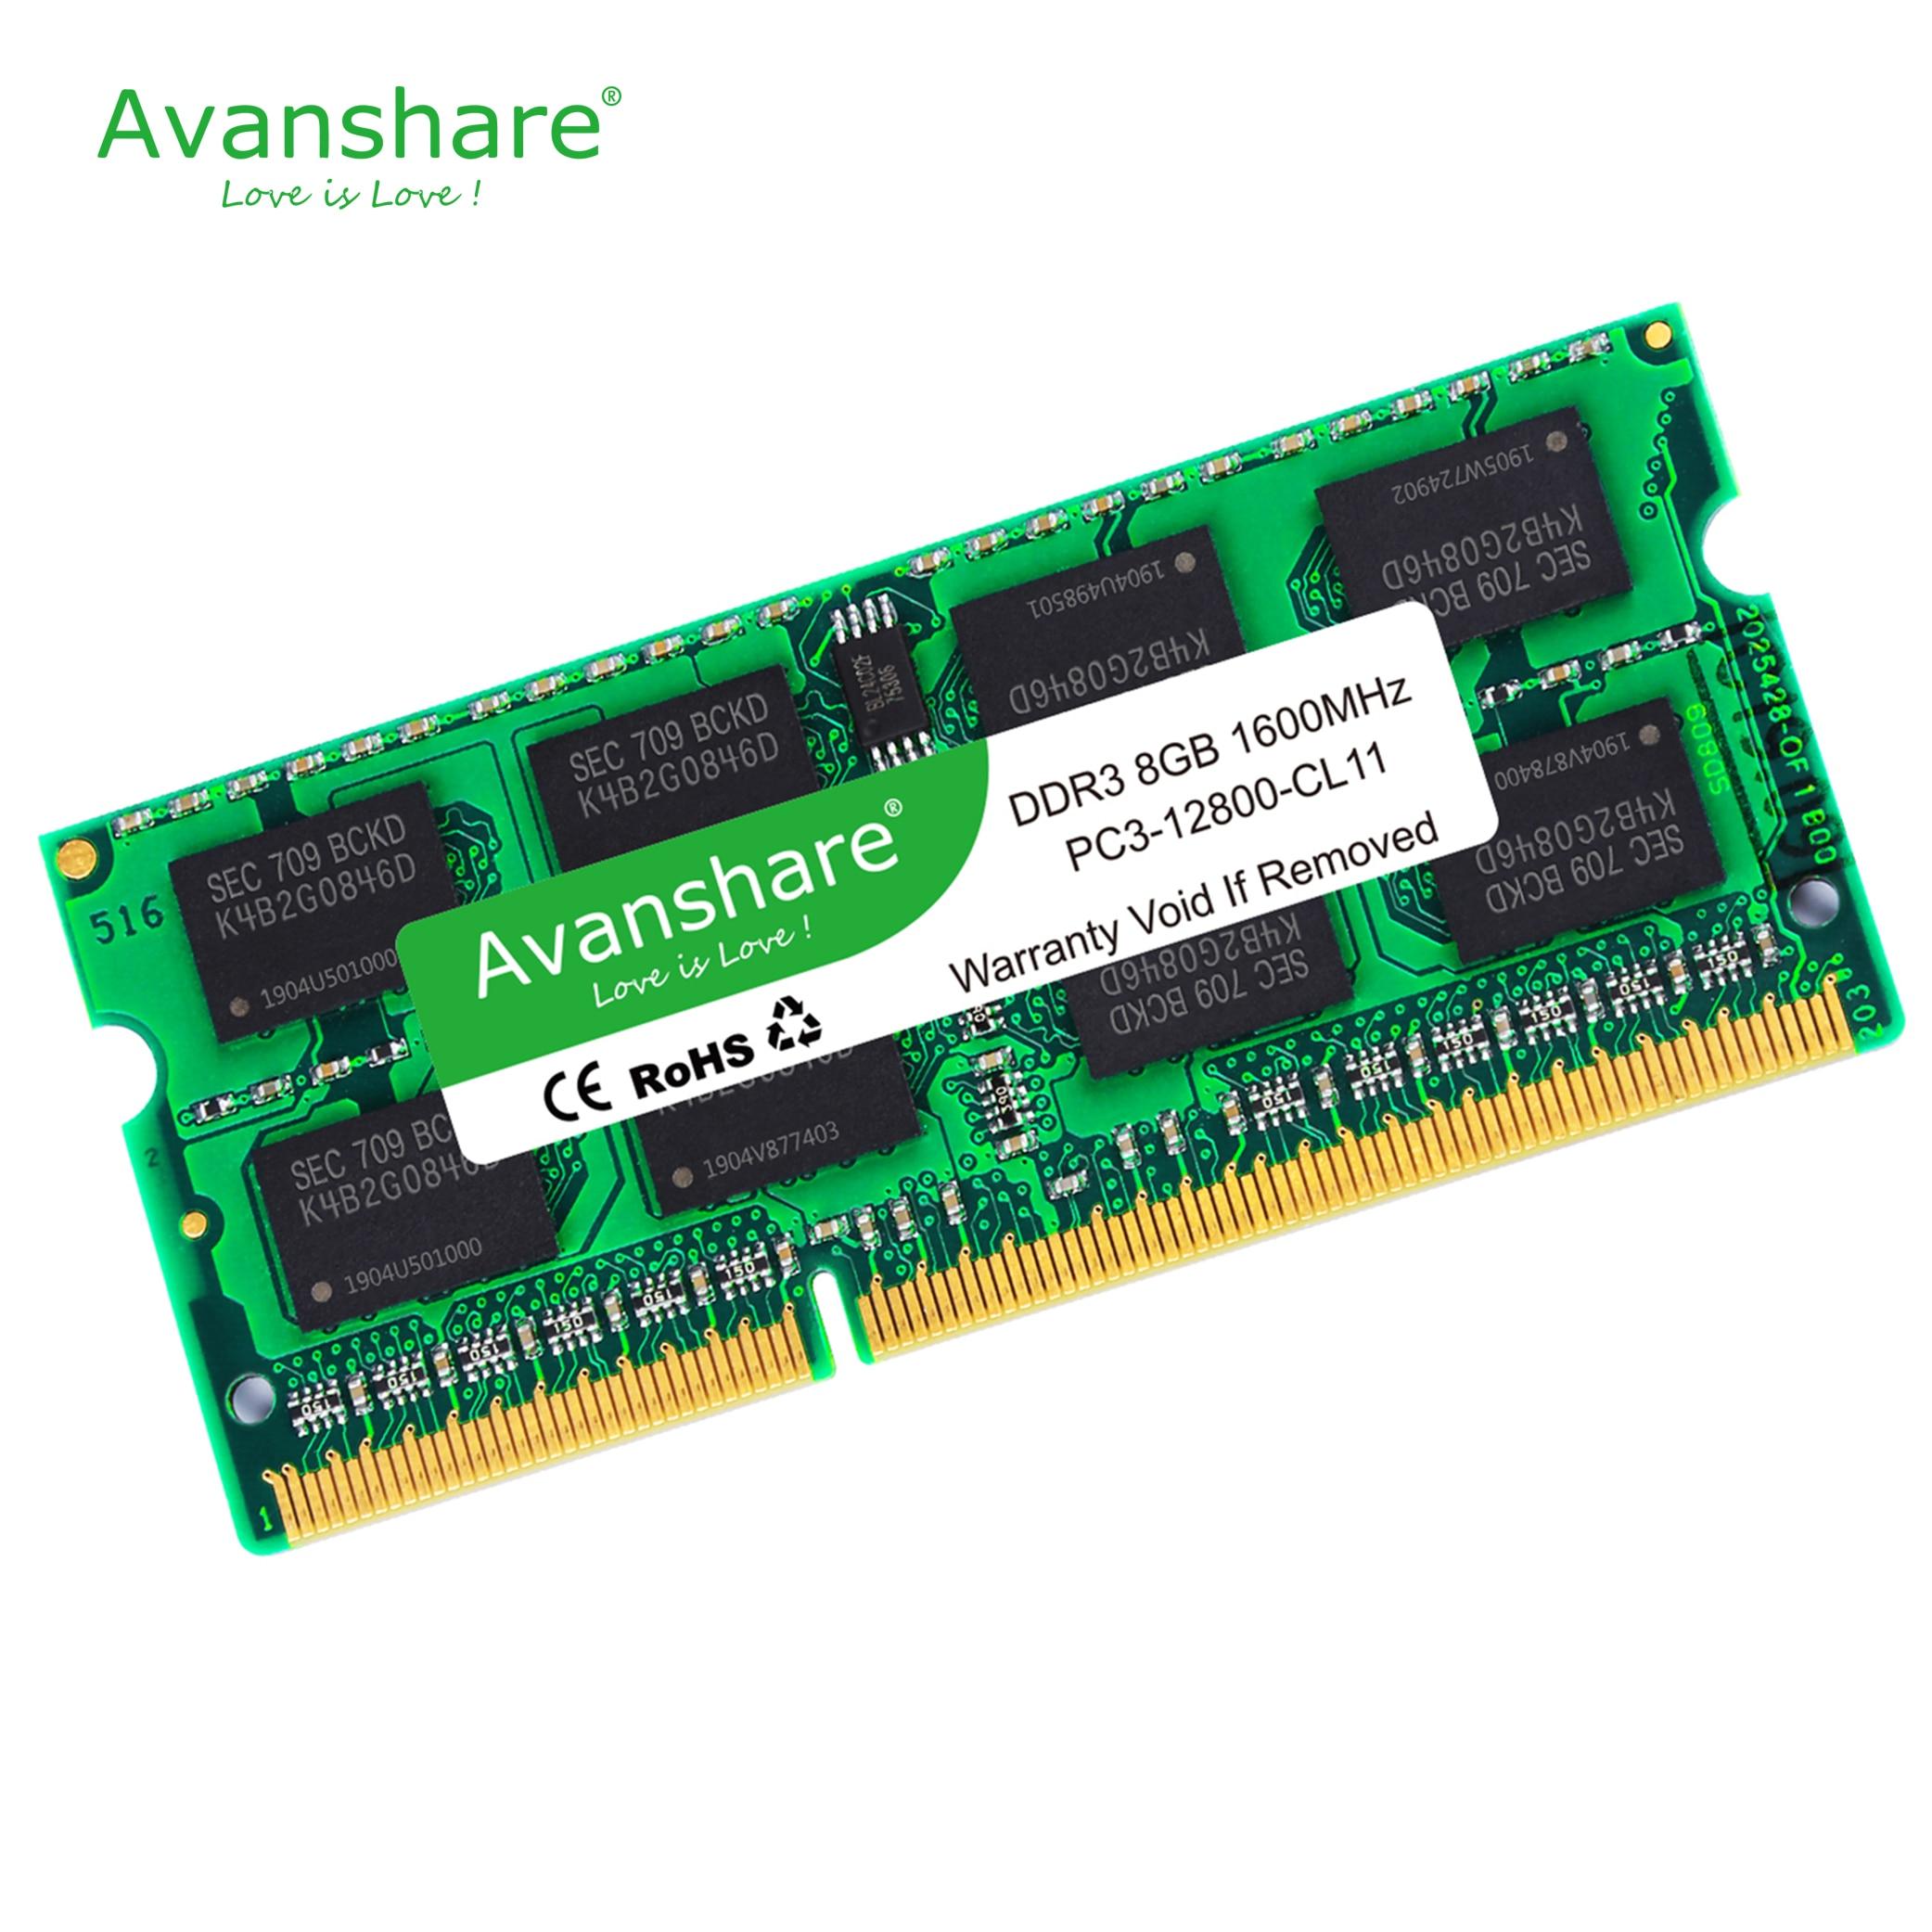 Memoria ddr3 8gb para portátil de 1600MHz sodimm macbook ram ddr3l 1600 compatible con ddr3 laptop 4gb 1333MHz sdram 1066mhz por Avanshare